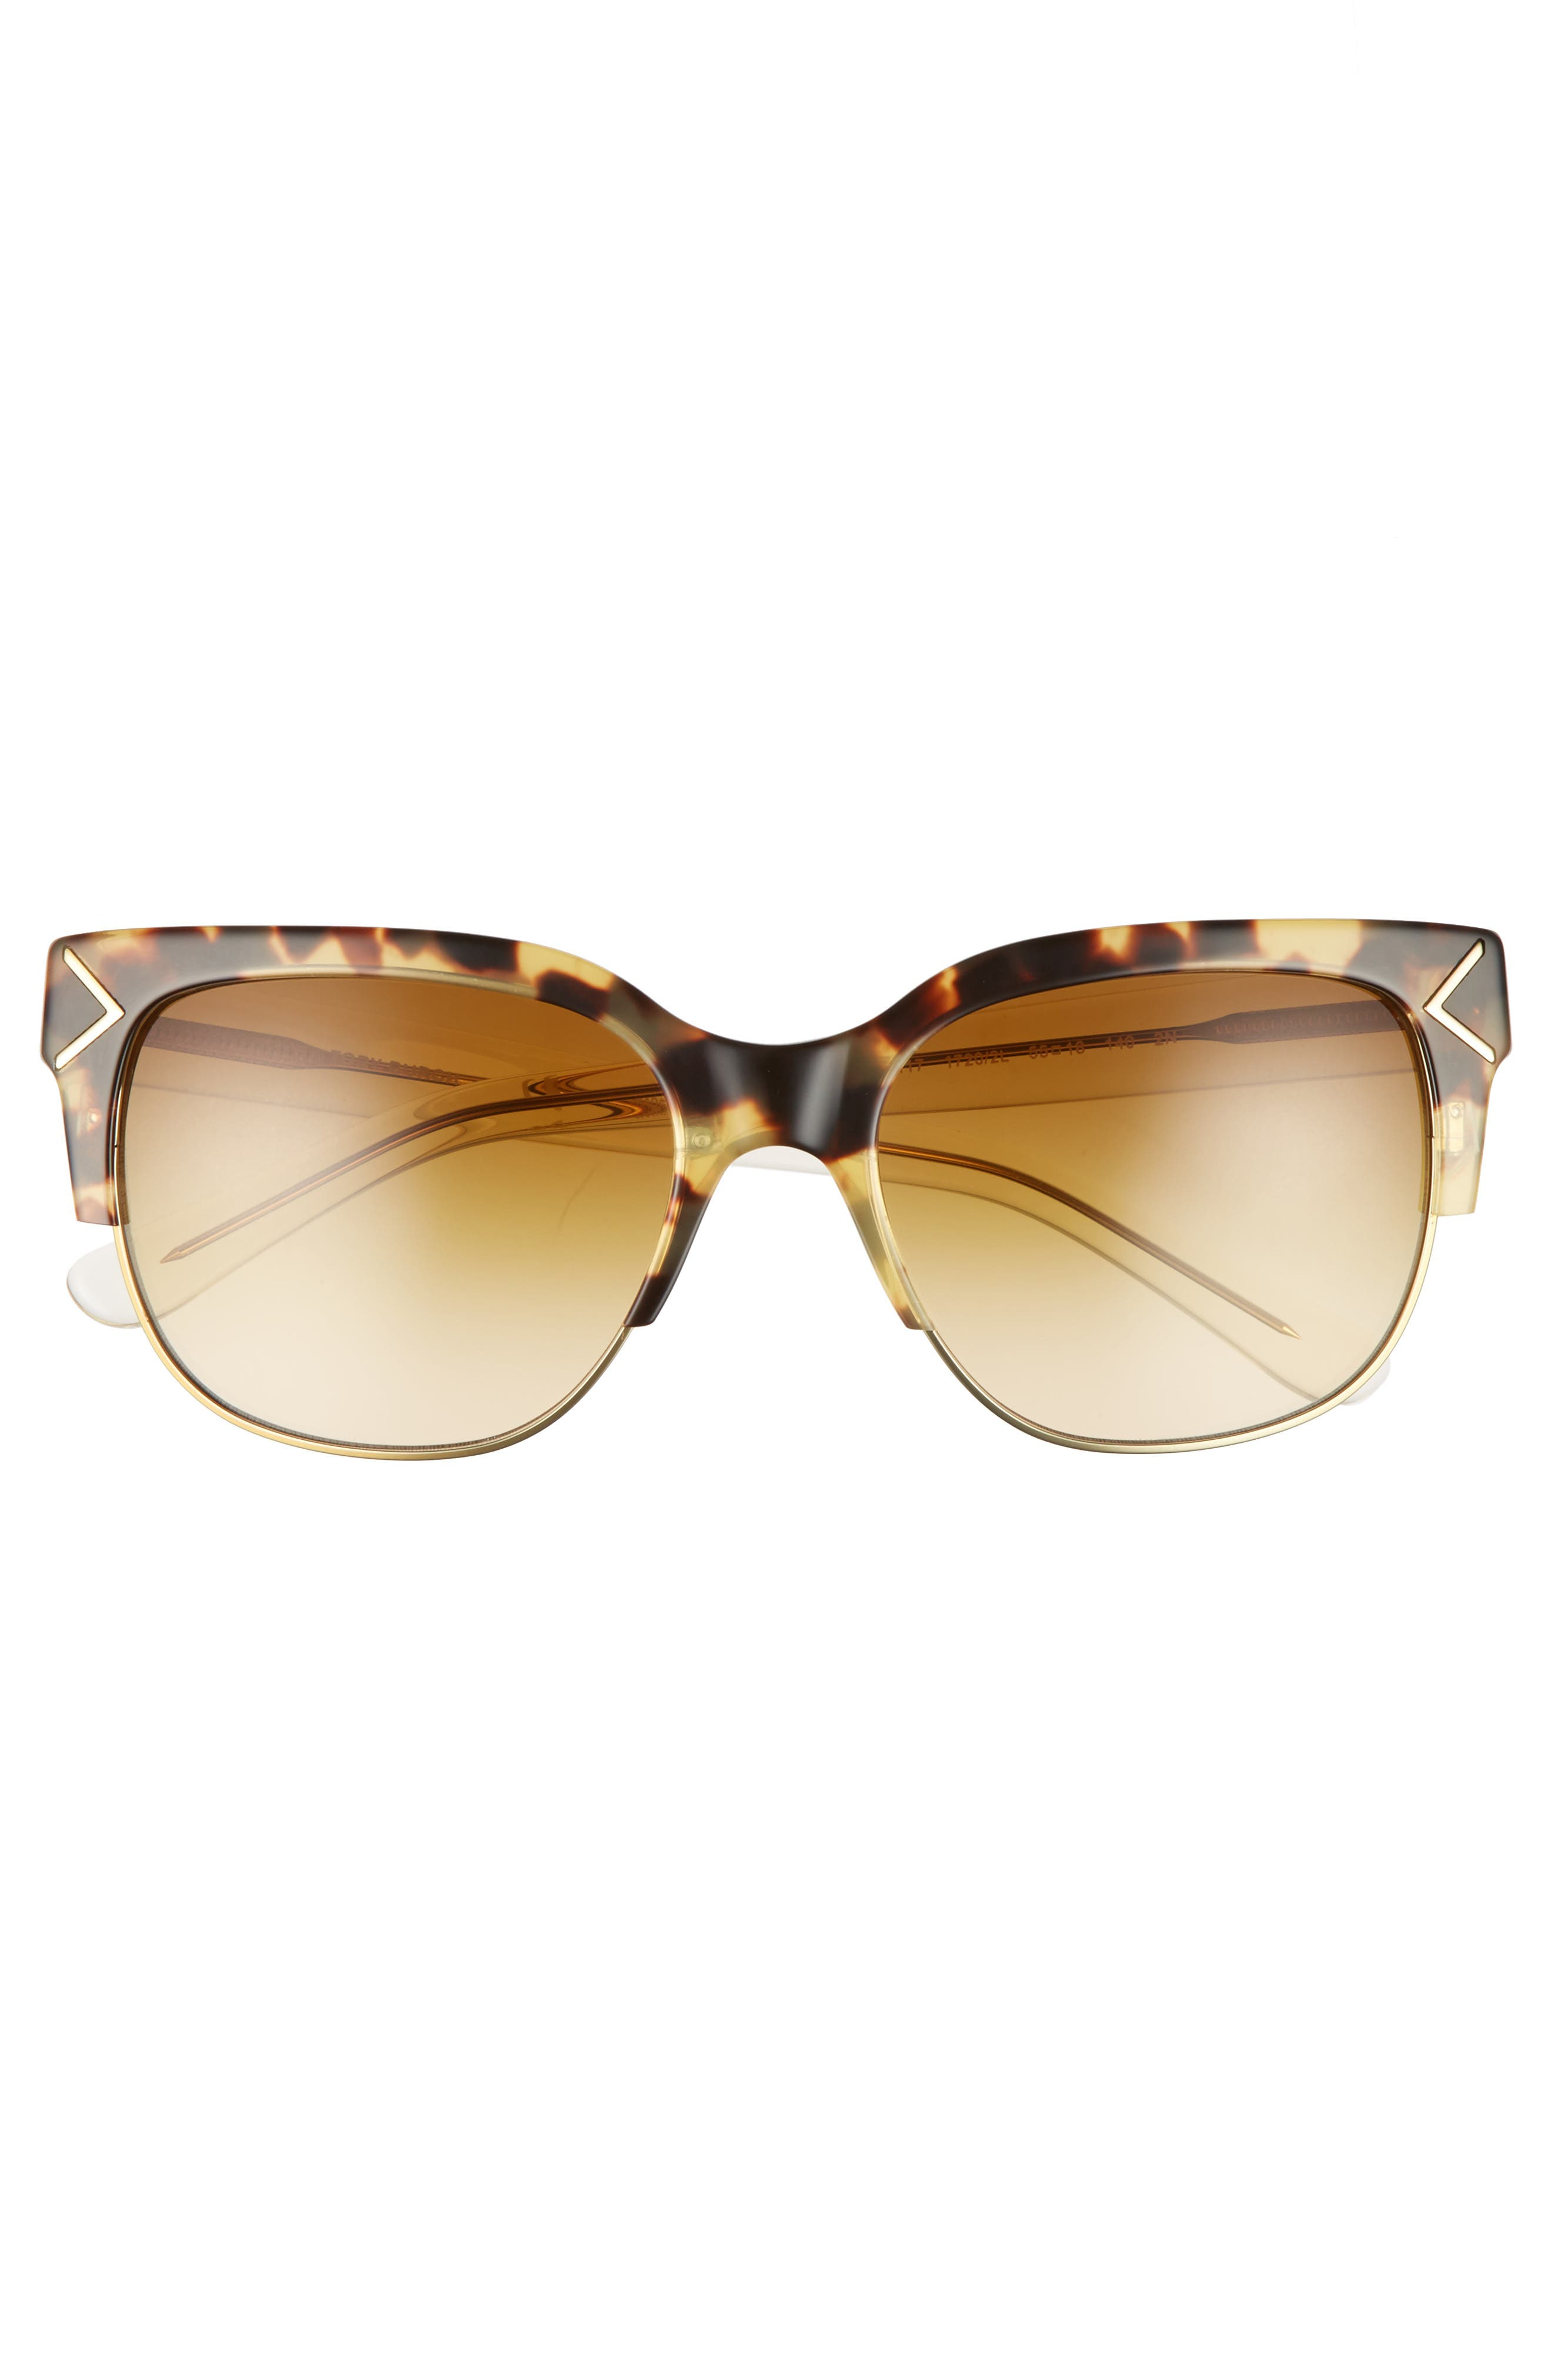 55mm Gradient Square Sunglasses,                             Alternate thumbnail 3, color,                             Gold/ Brown